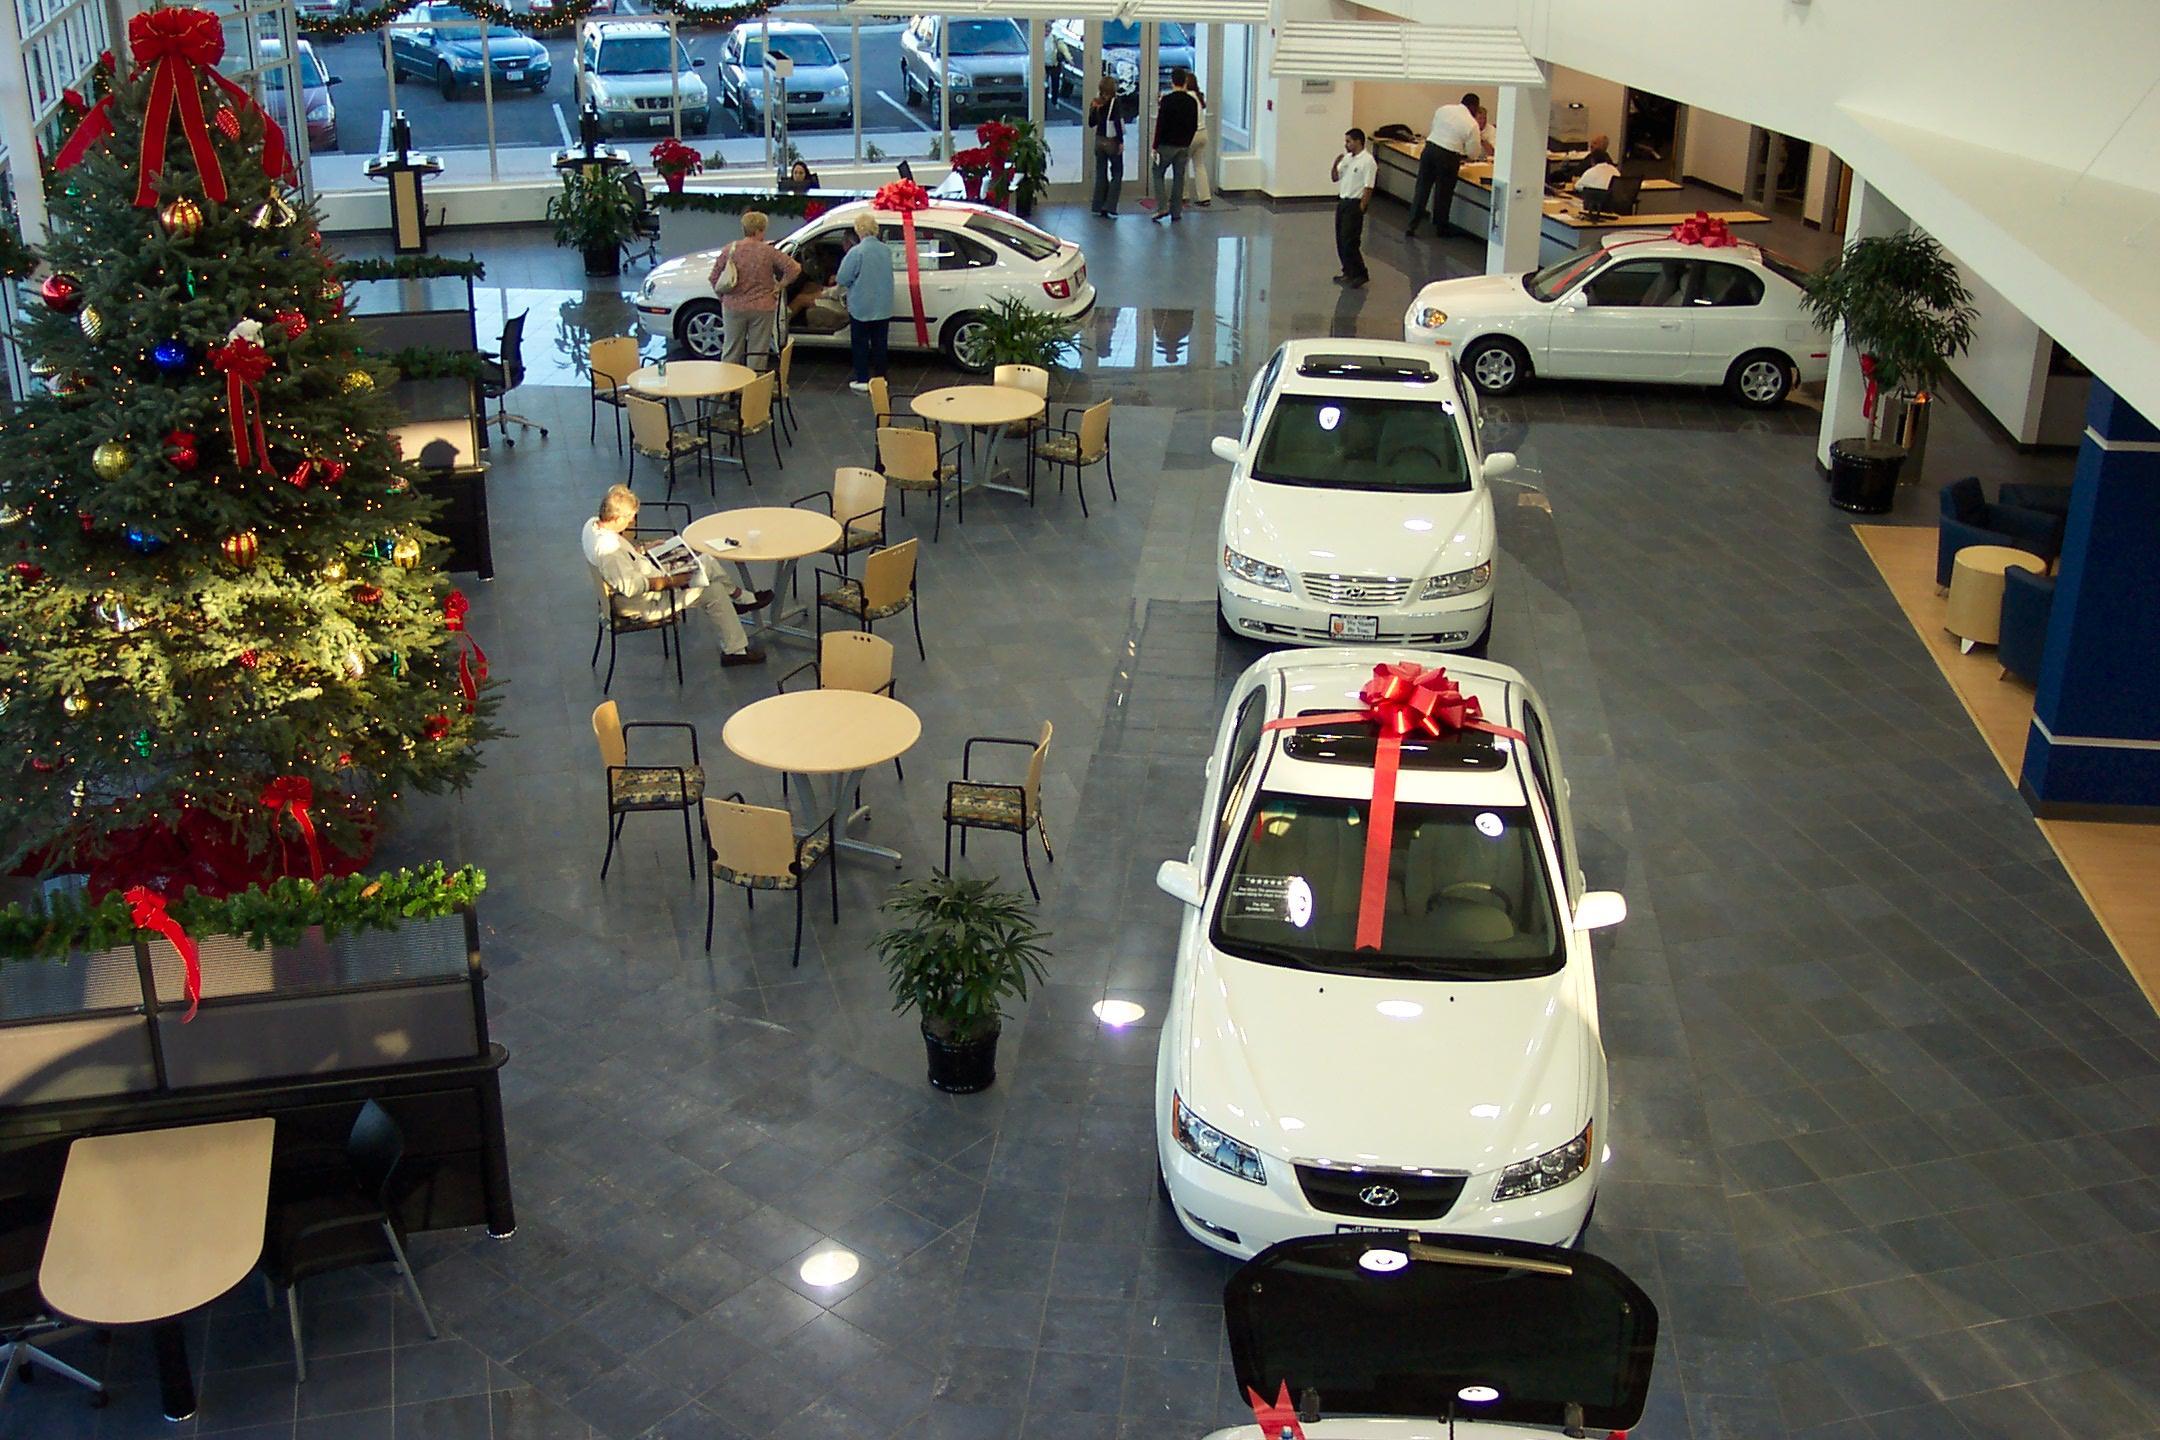 Ou0027Brien Hyundai Showroom Above